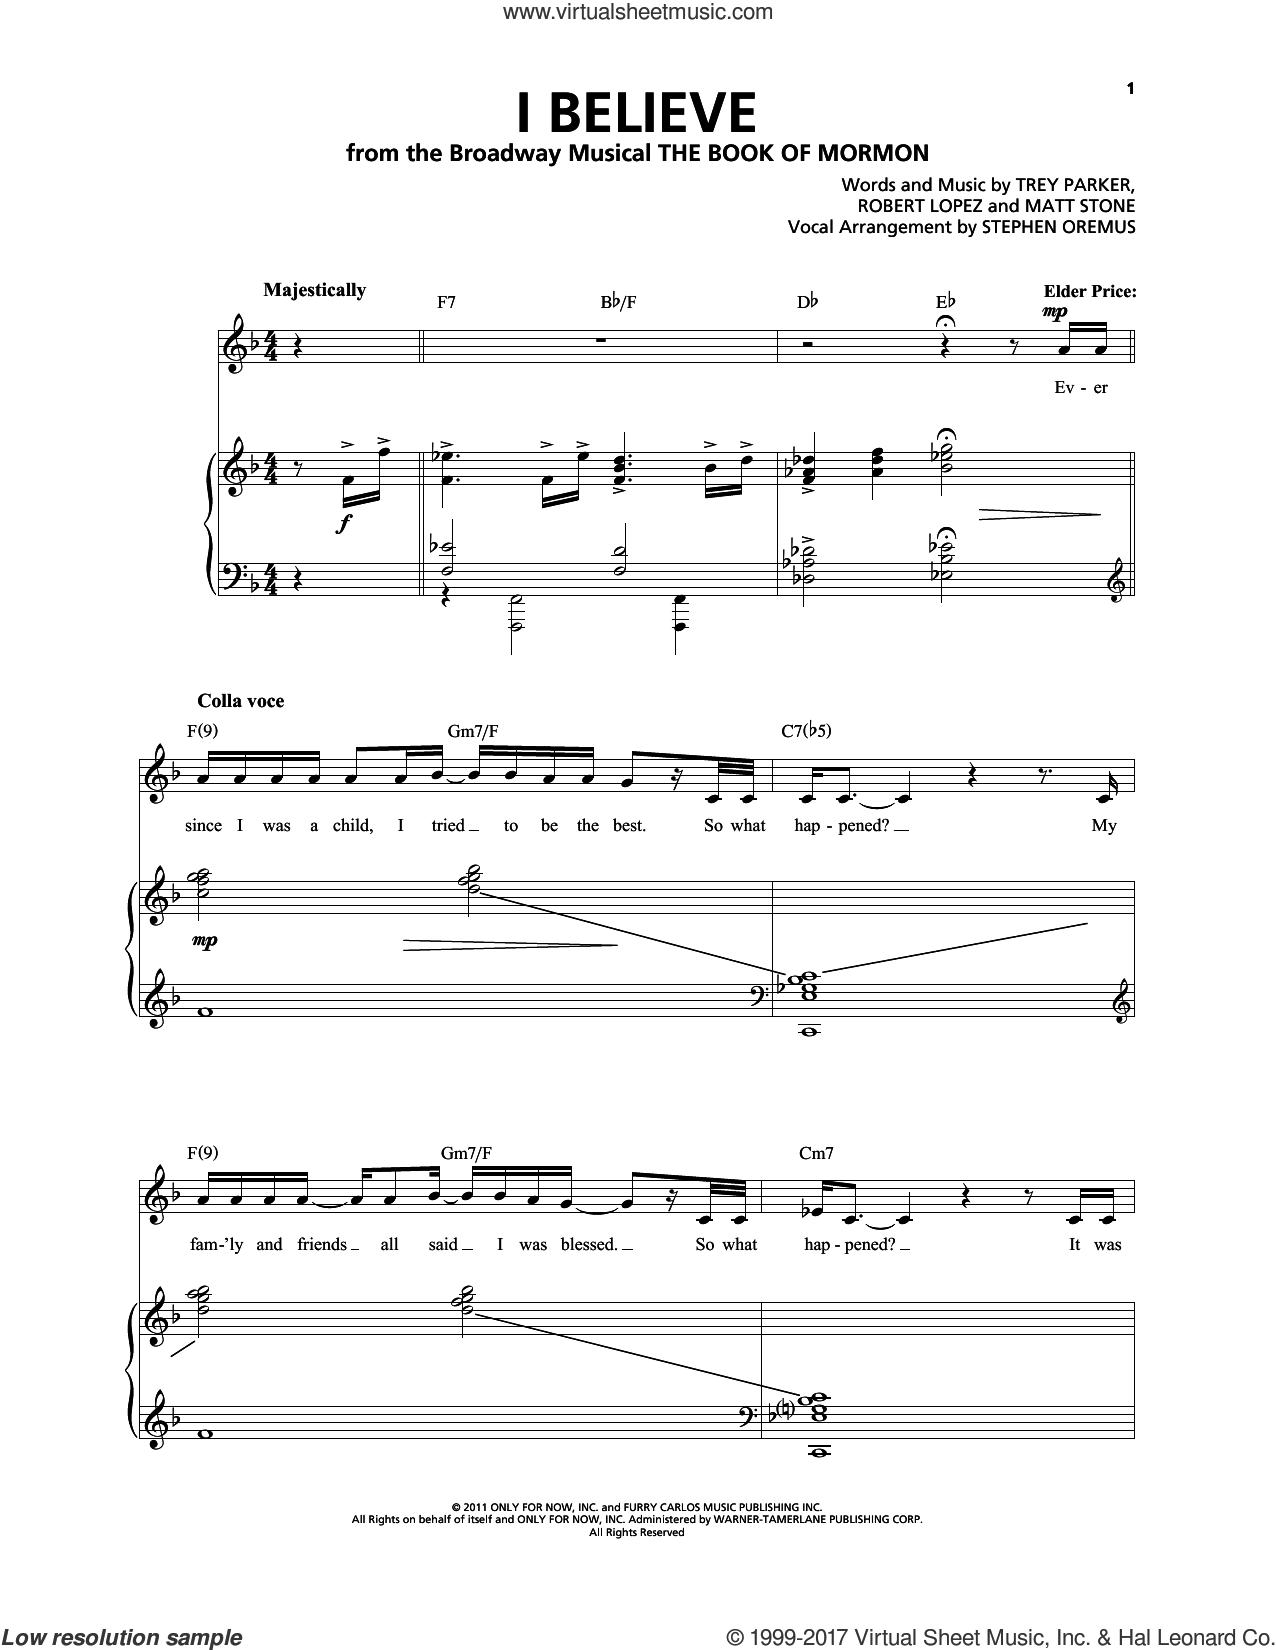 I Believe sheet music for voice and piano by Robert Lopez, Matt Stone, Trey Parker and Trey Parker & Matt Stone, intermediate skill level